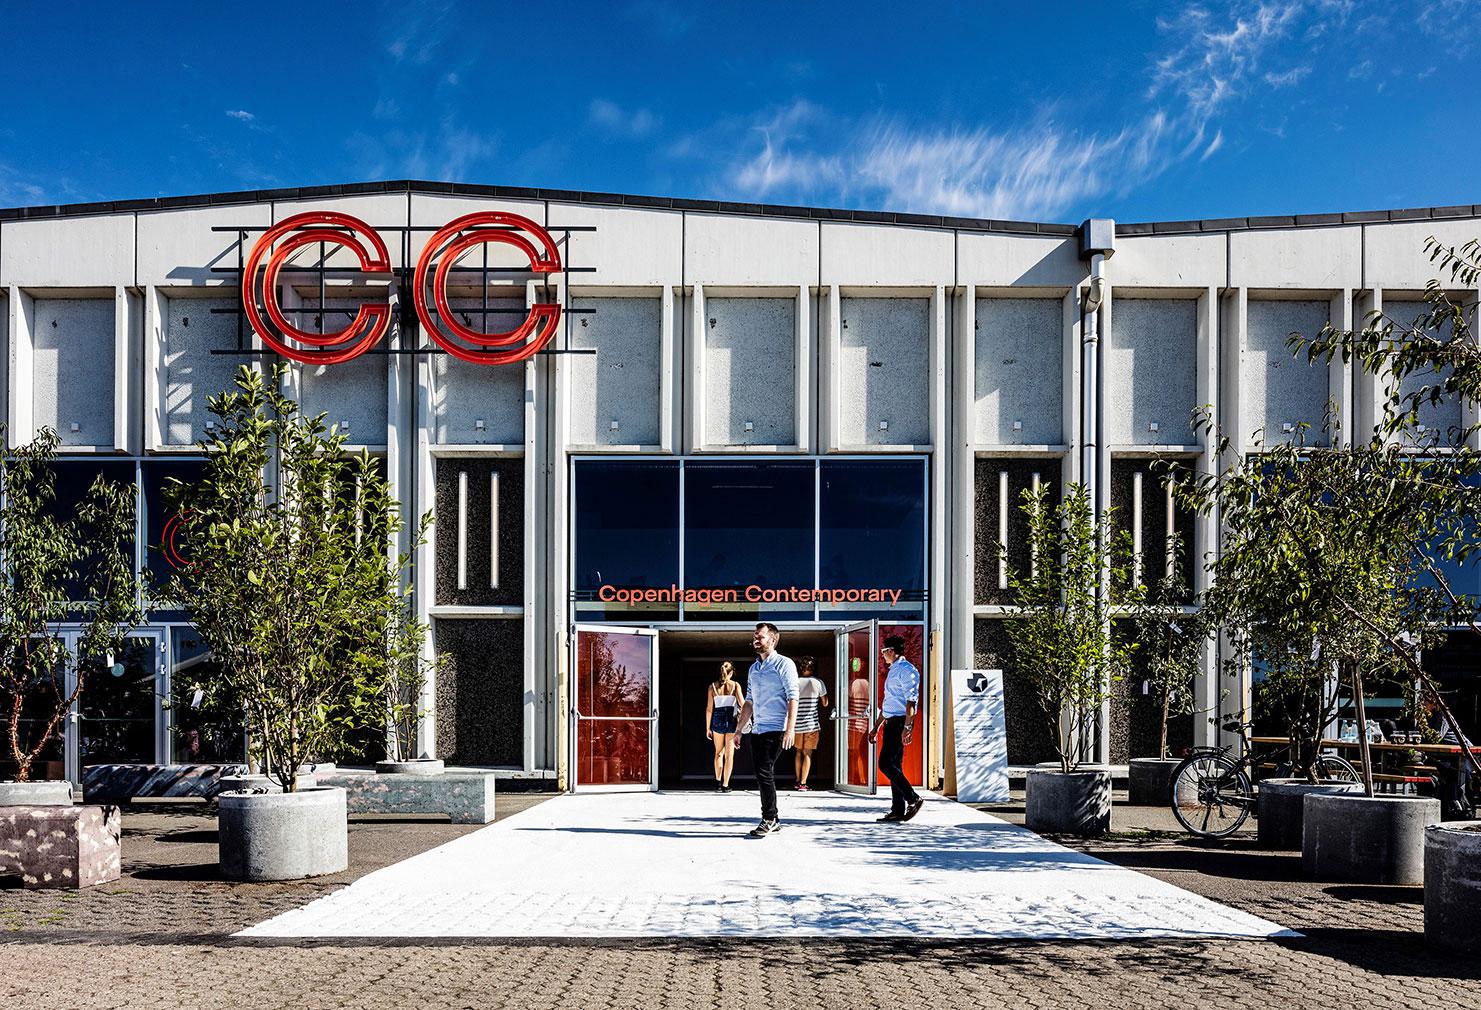 Copenhagen Contemporary art centre